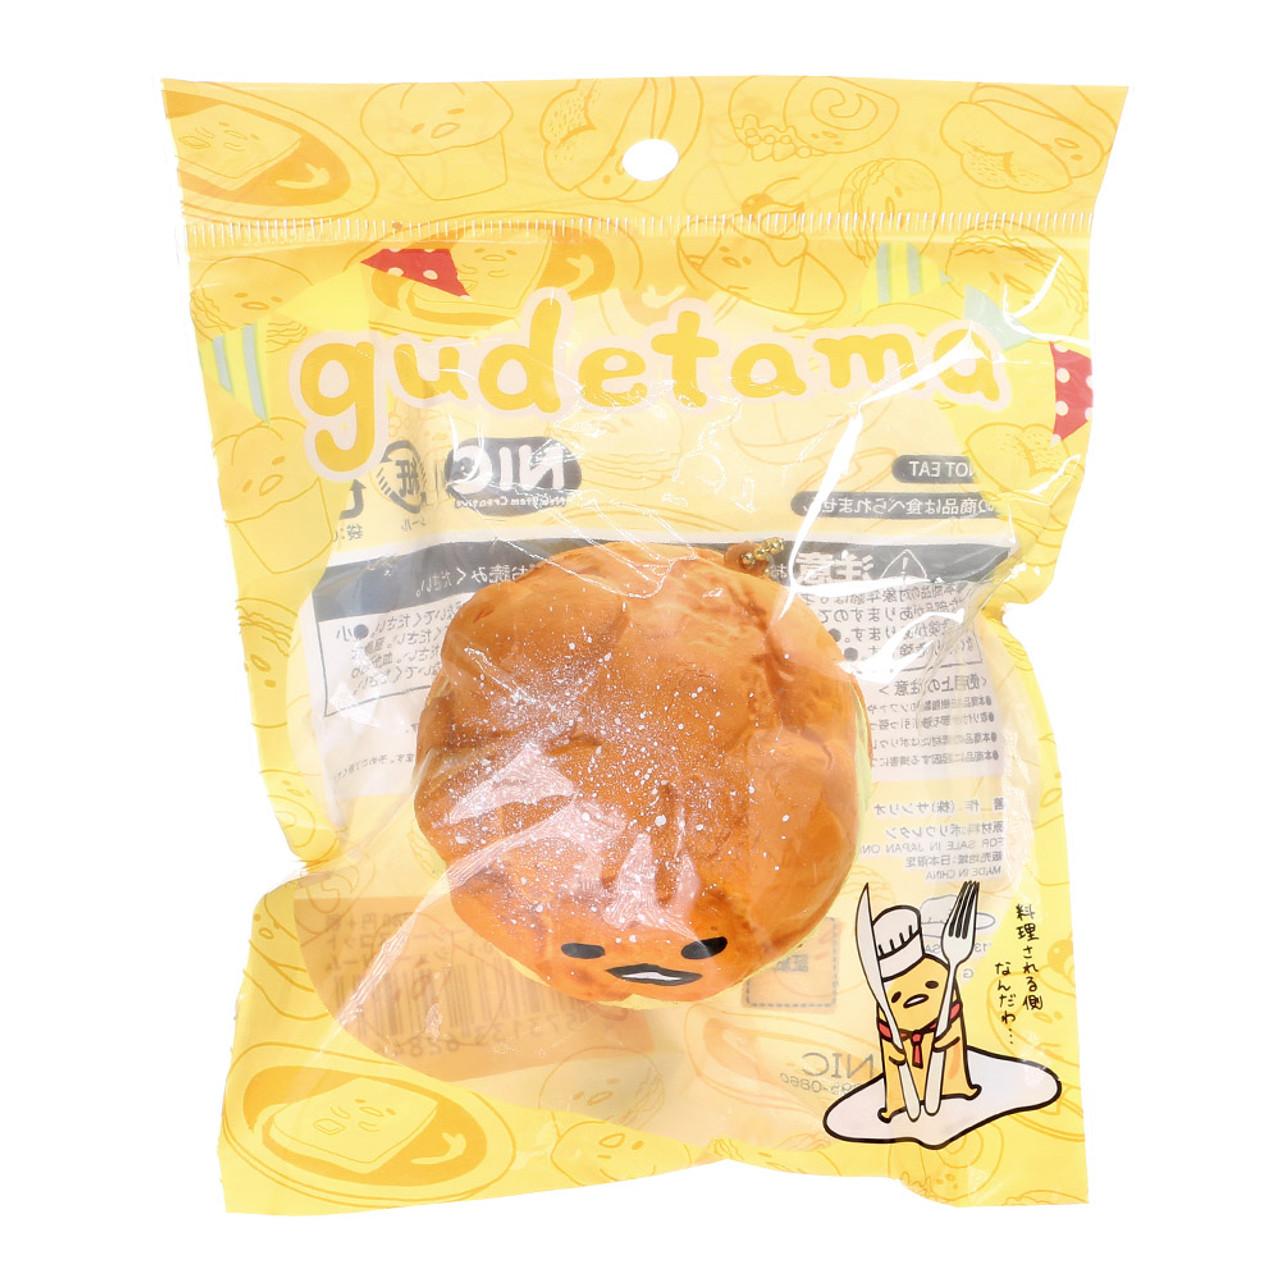 Sanrio Gudetama Lazy Egg Cream Puff Squishy Mascot Toys Charms